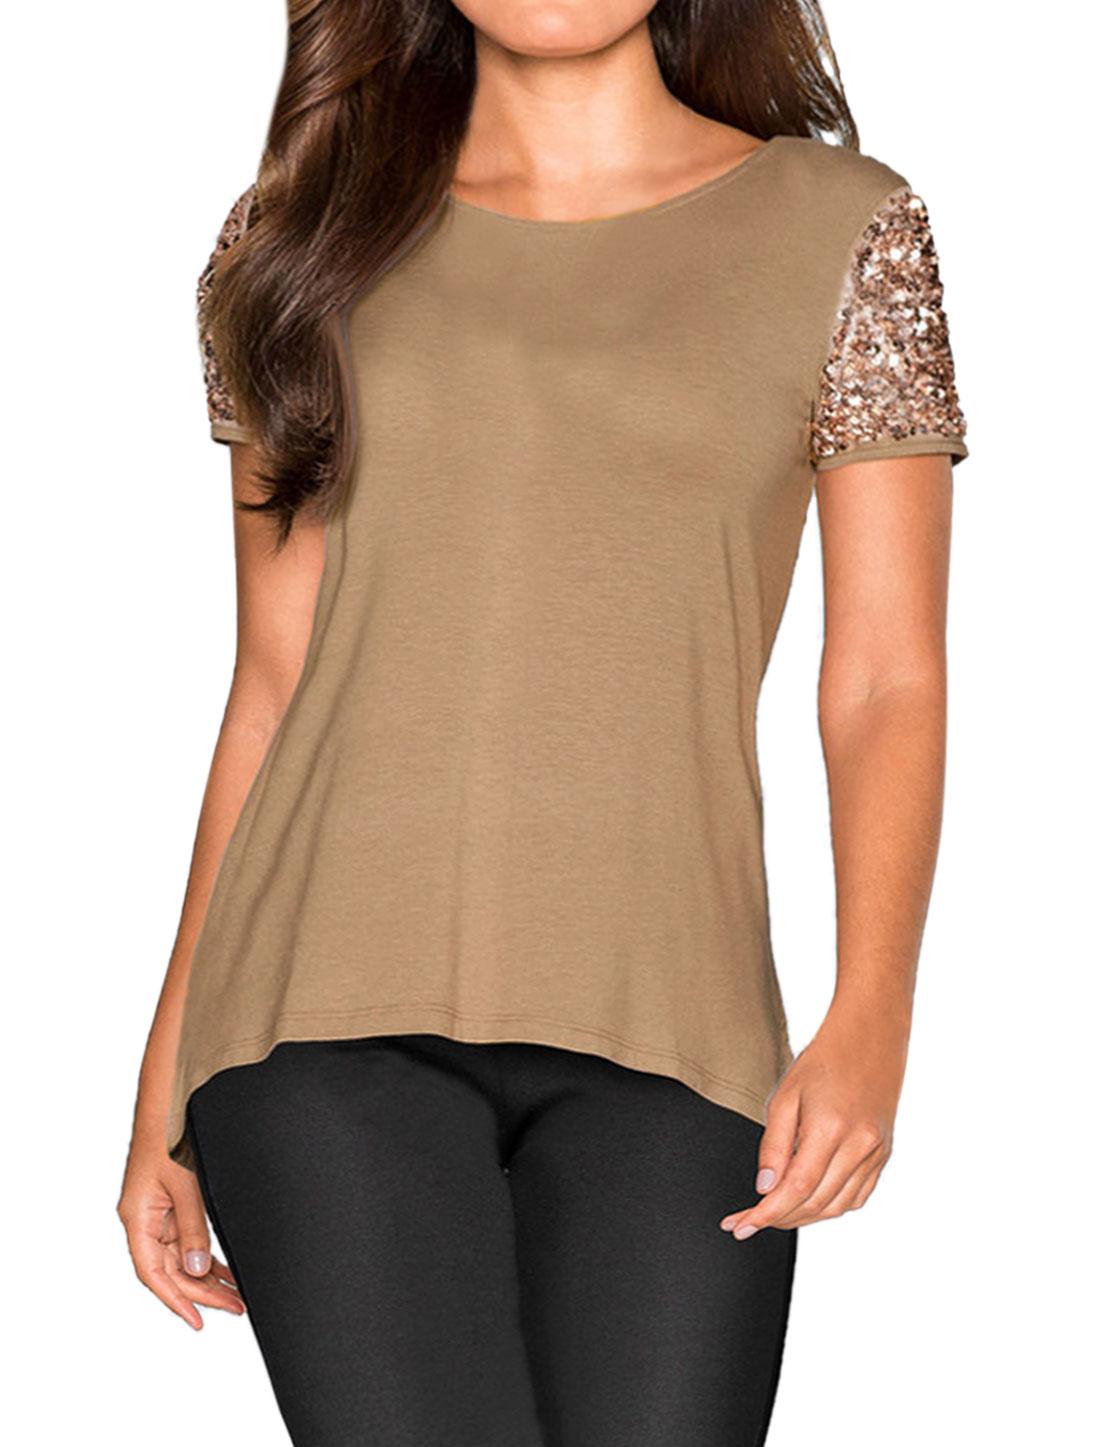 Women Sequin Embellished Short Sleeves High Low Hem Tee Shirt Brown XS